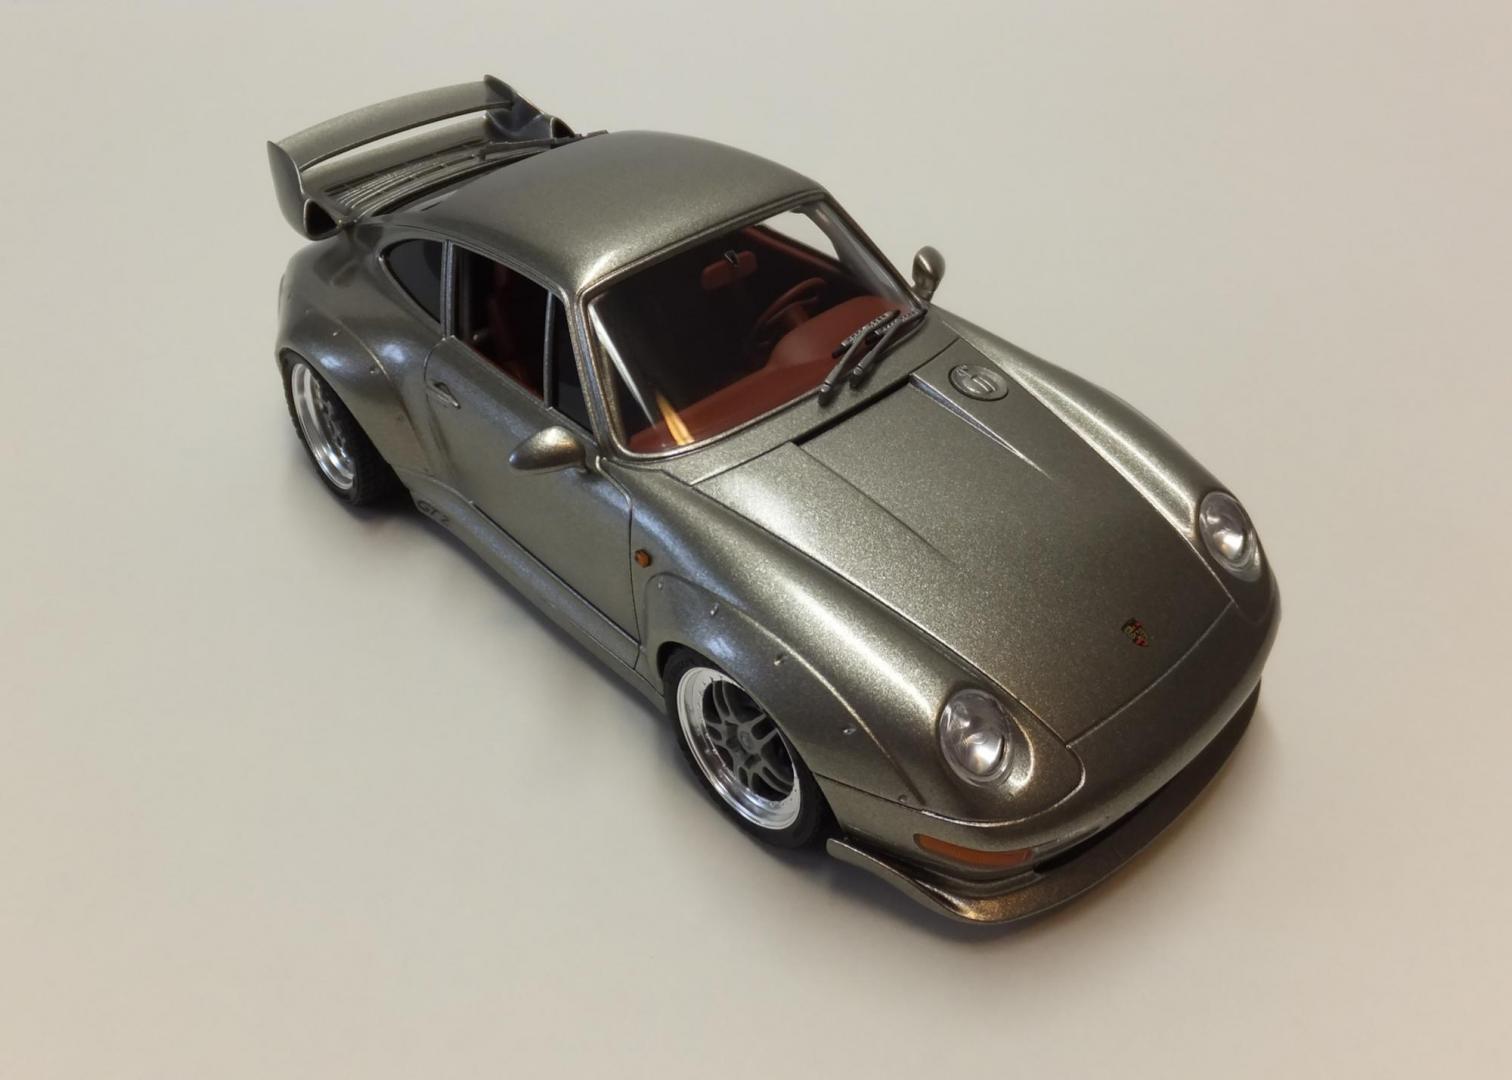 tamiya porsche 911 gt2 street vers under glass model. Black Bedroom Furniture Sets. Home Design Ideas